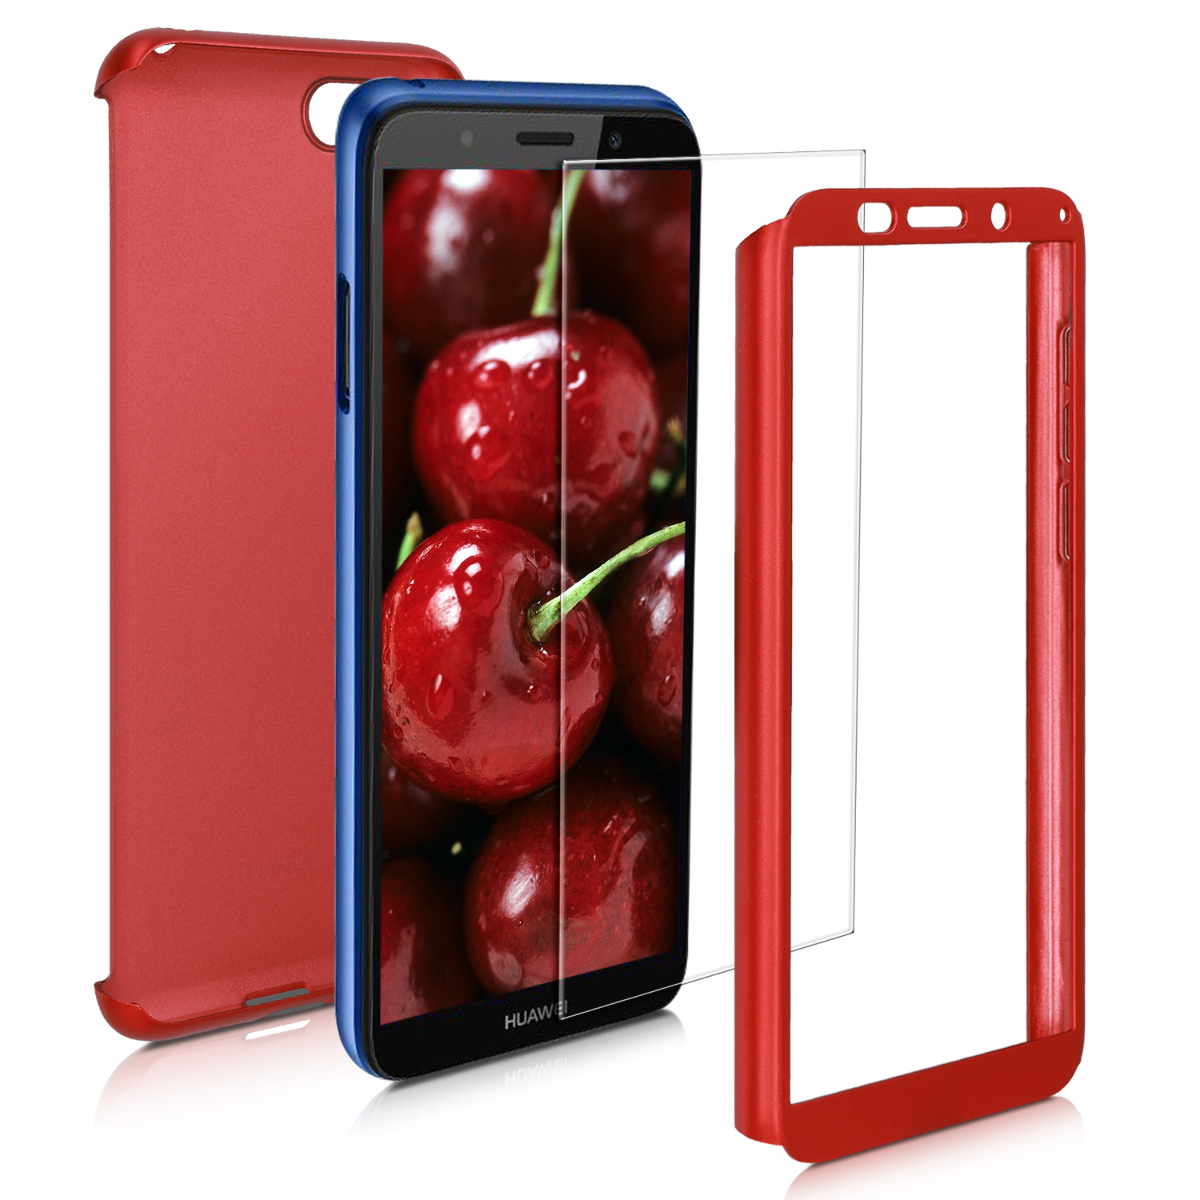 KW Θήκη Full Body Huawei Y5 / Y5 Prime 2018 & Tempered Glass - Metallic Dark Red (48887.36)